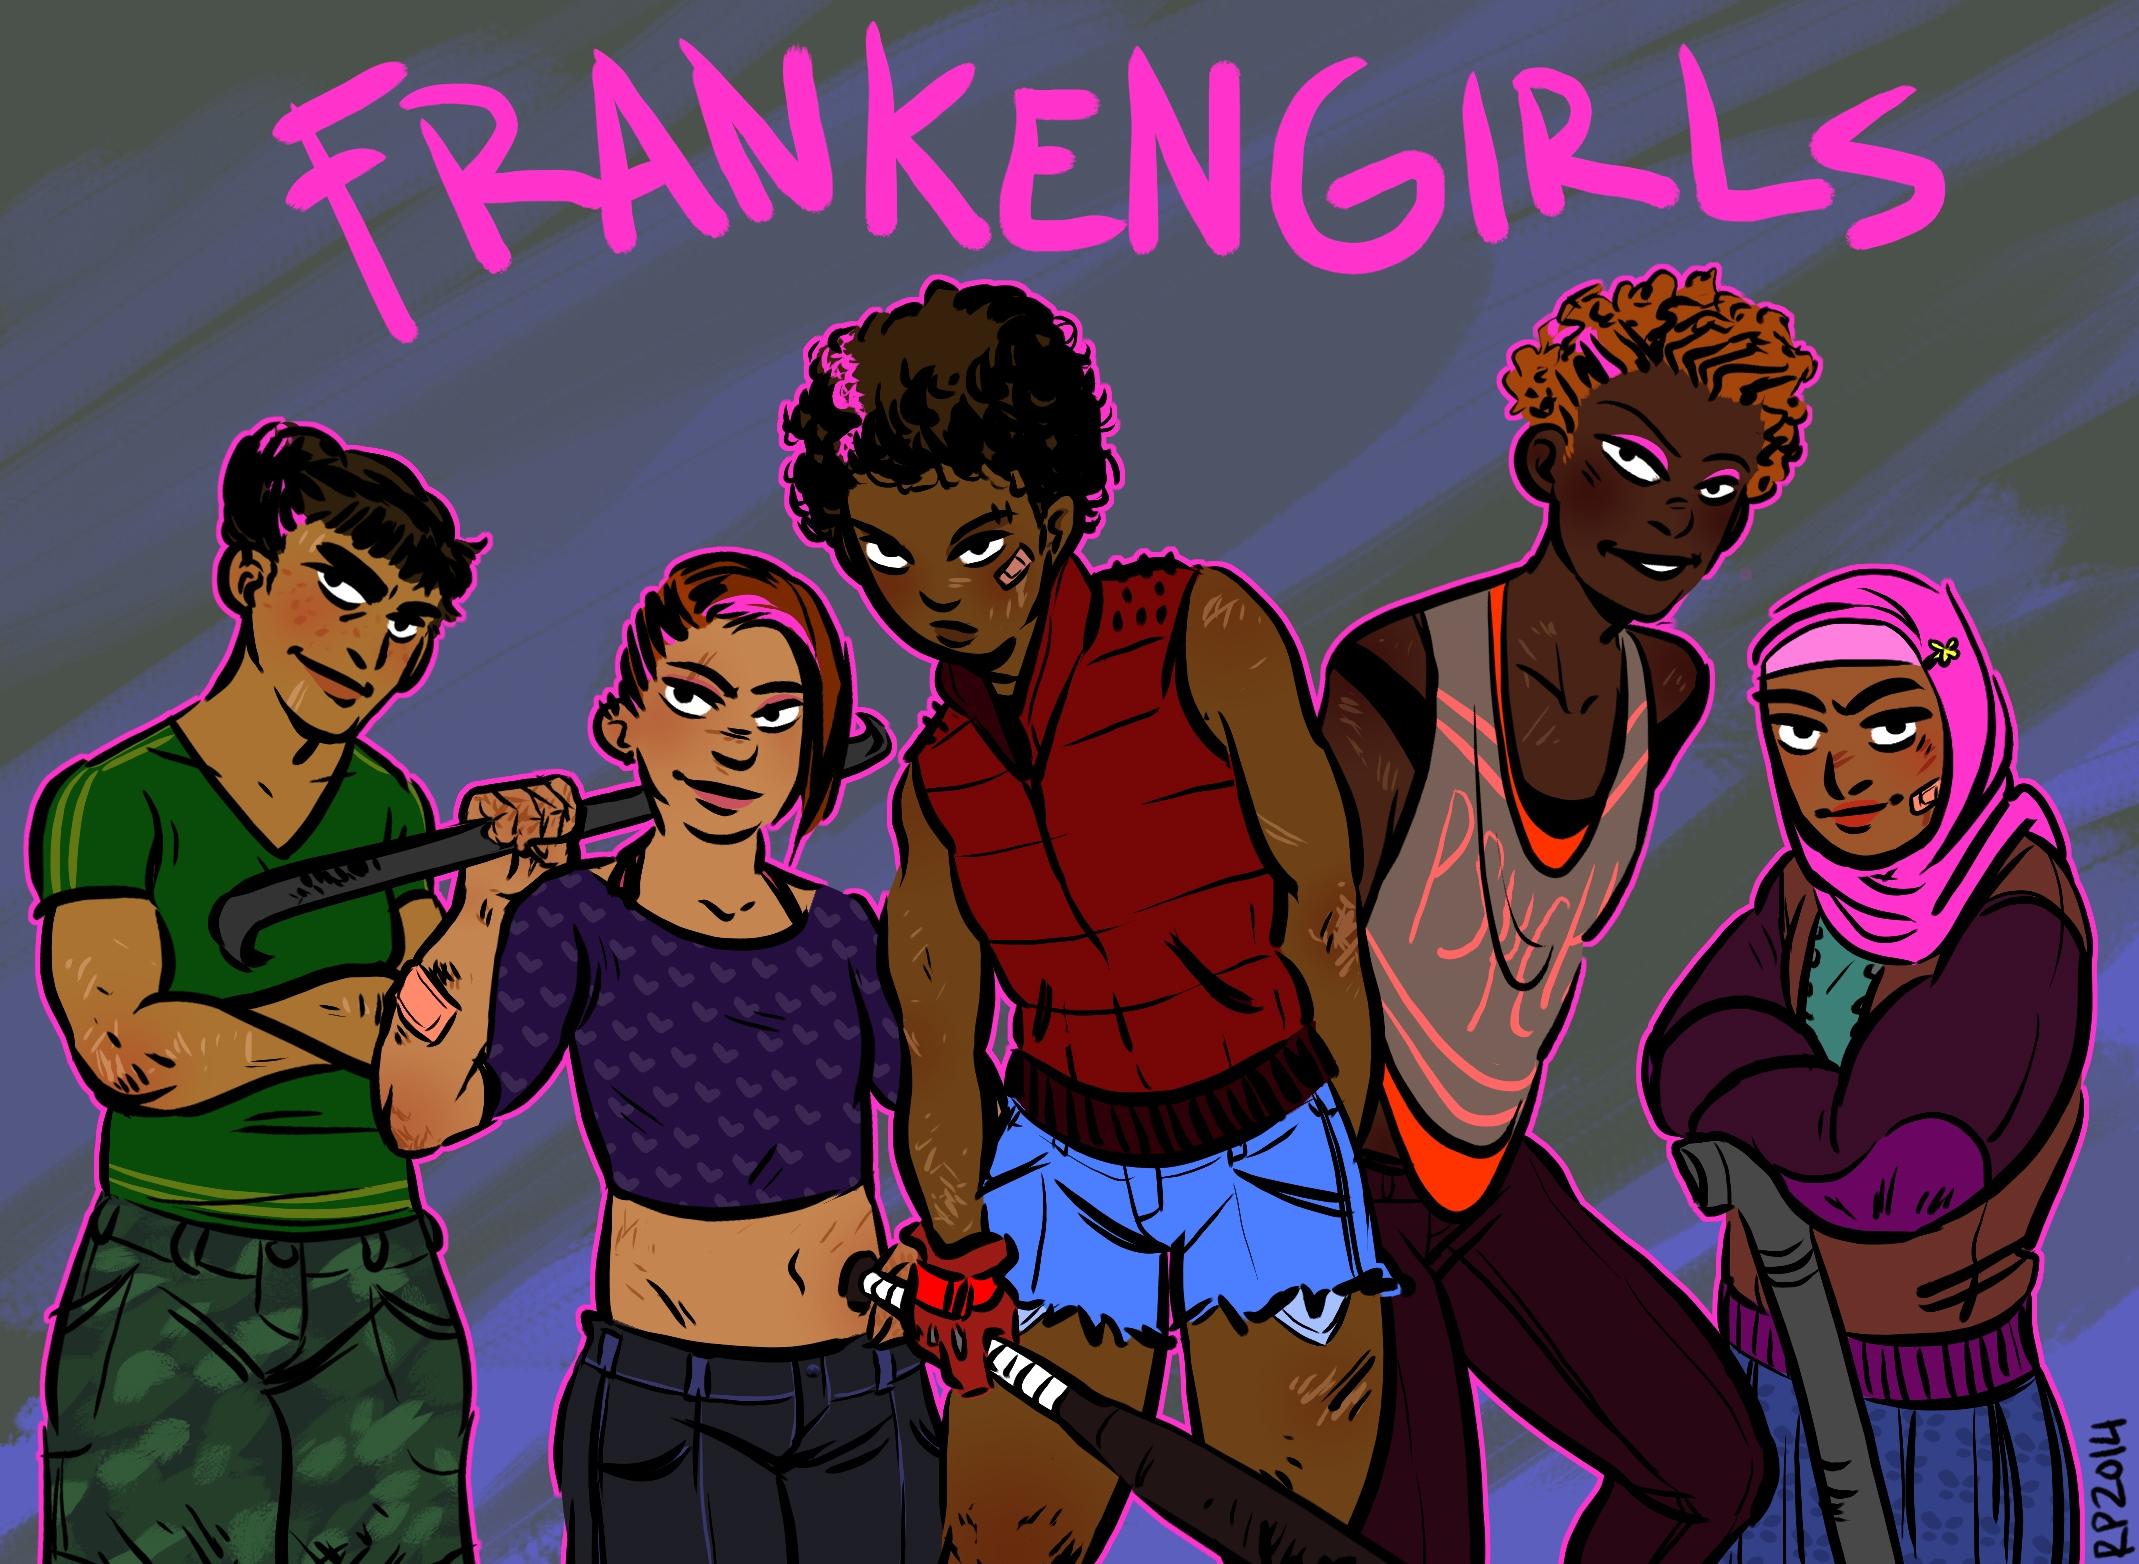 girl gang crush - frankengirls, girlgang - rachelpoulson | ello